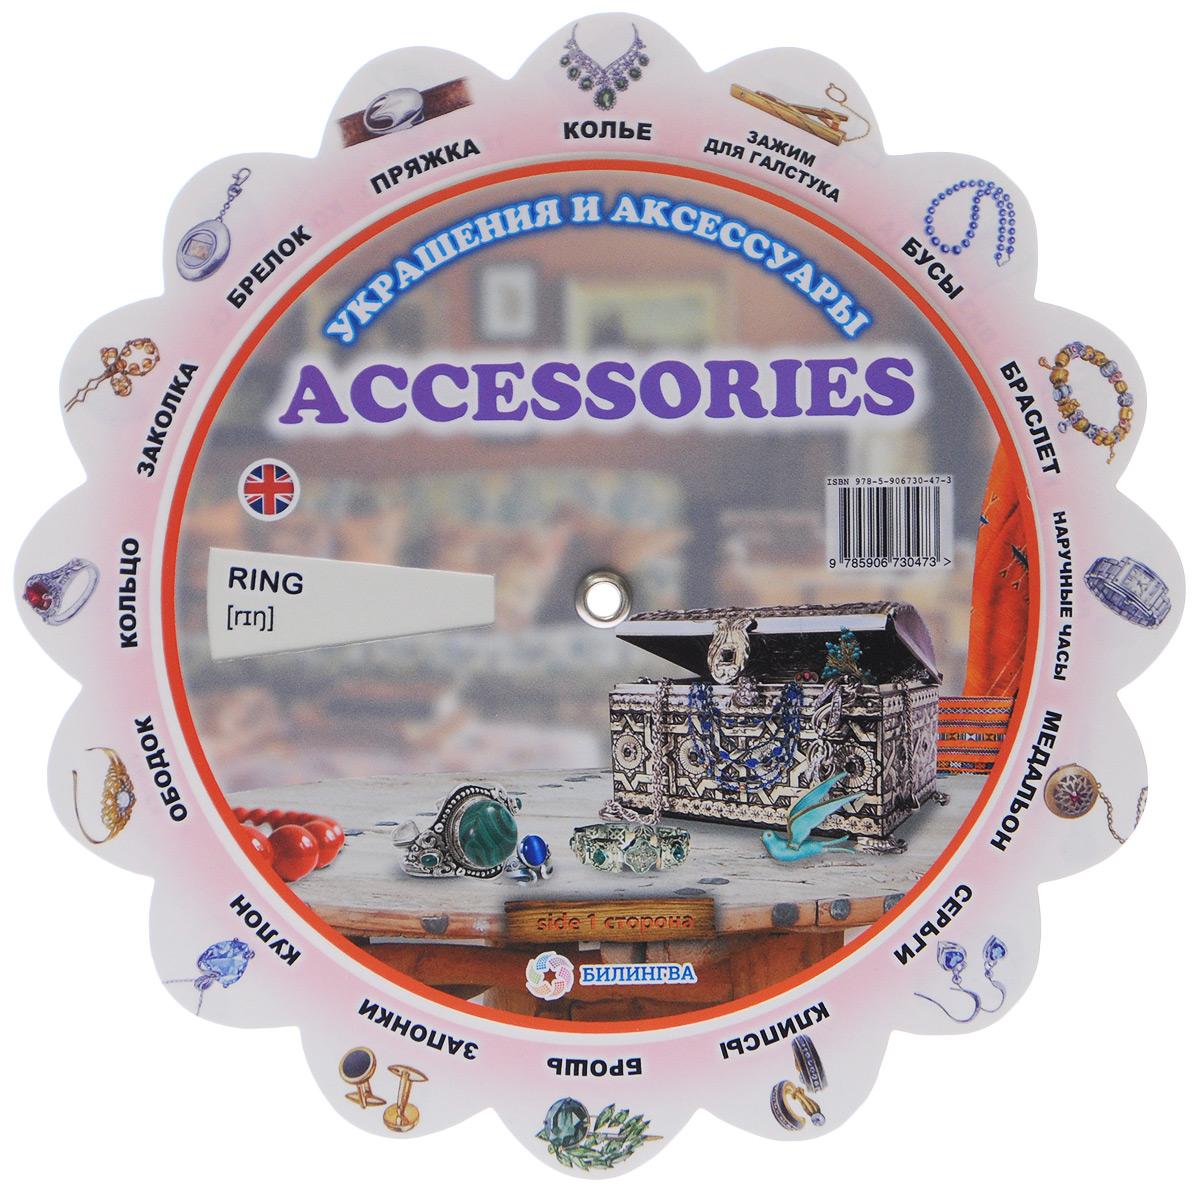 Accessories / ��������� � ����������. ���������������� ������������ �������